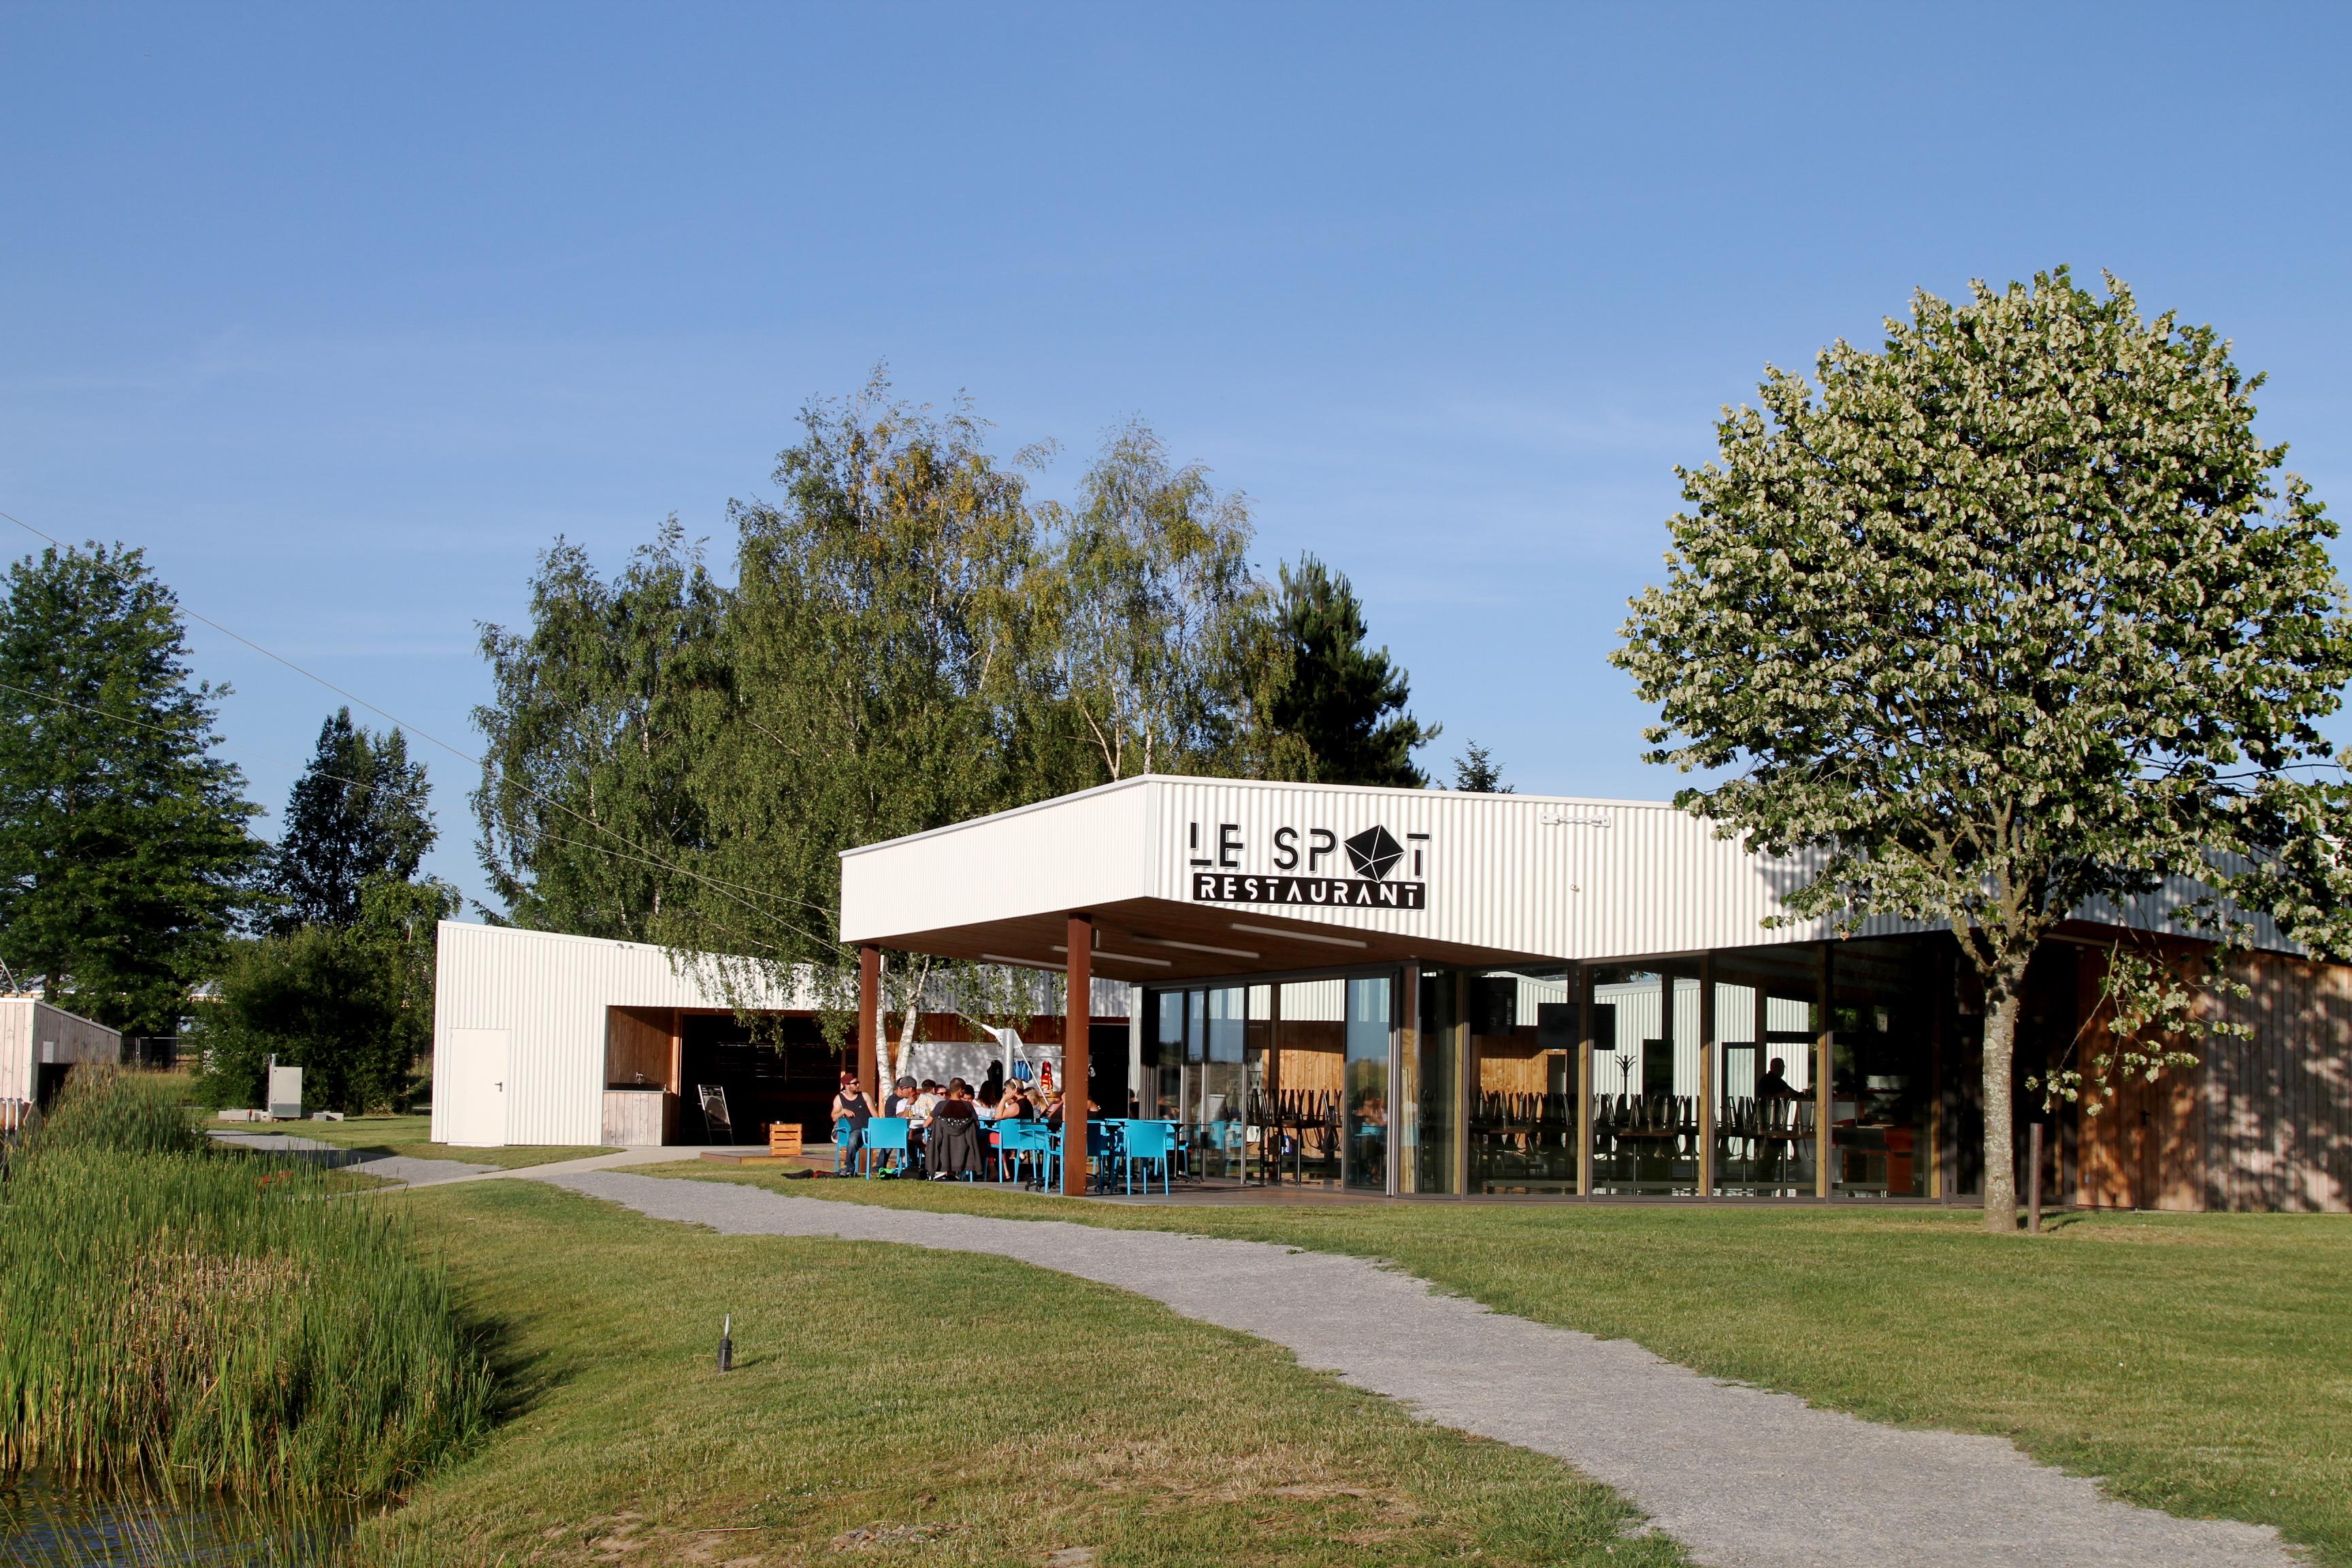 https://cdt44.media.tourinsoft.eu/upload/restaurant-lespot-nozay-3.JPG